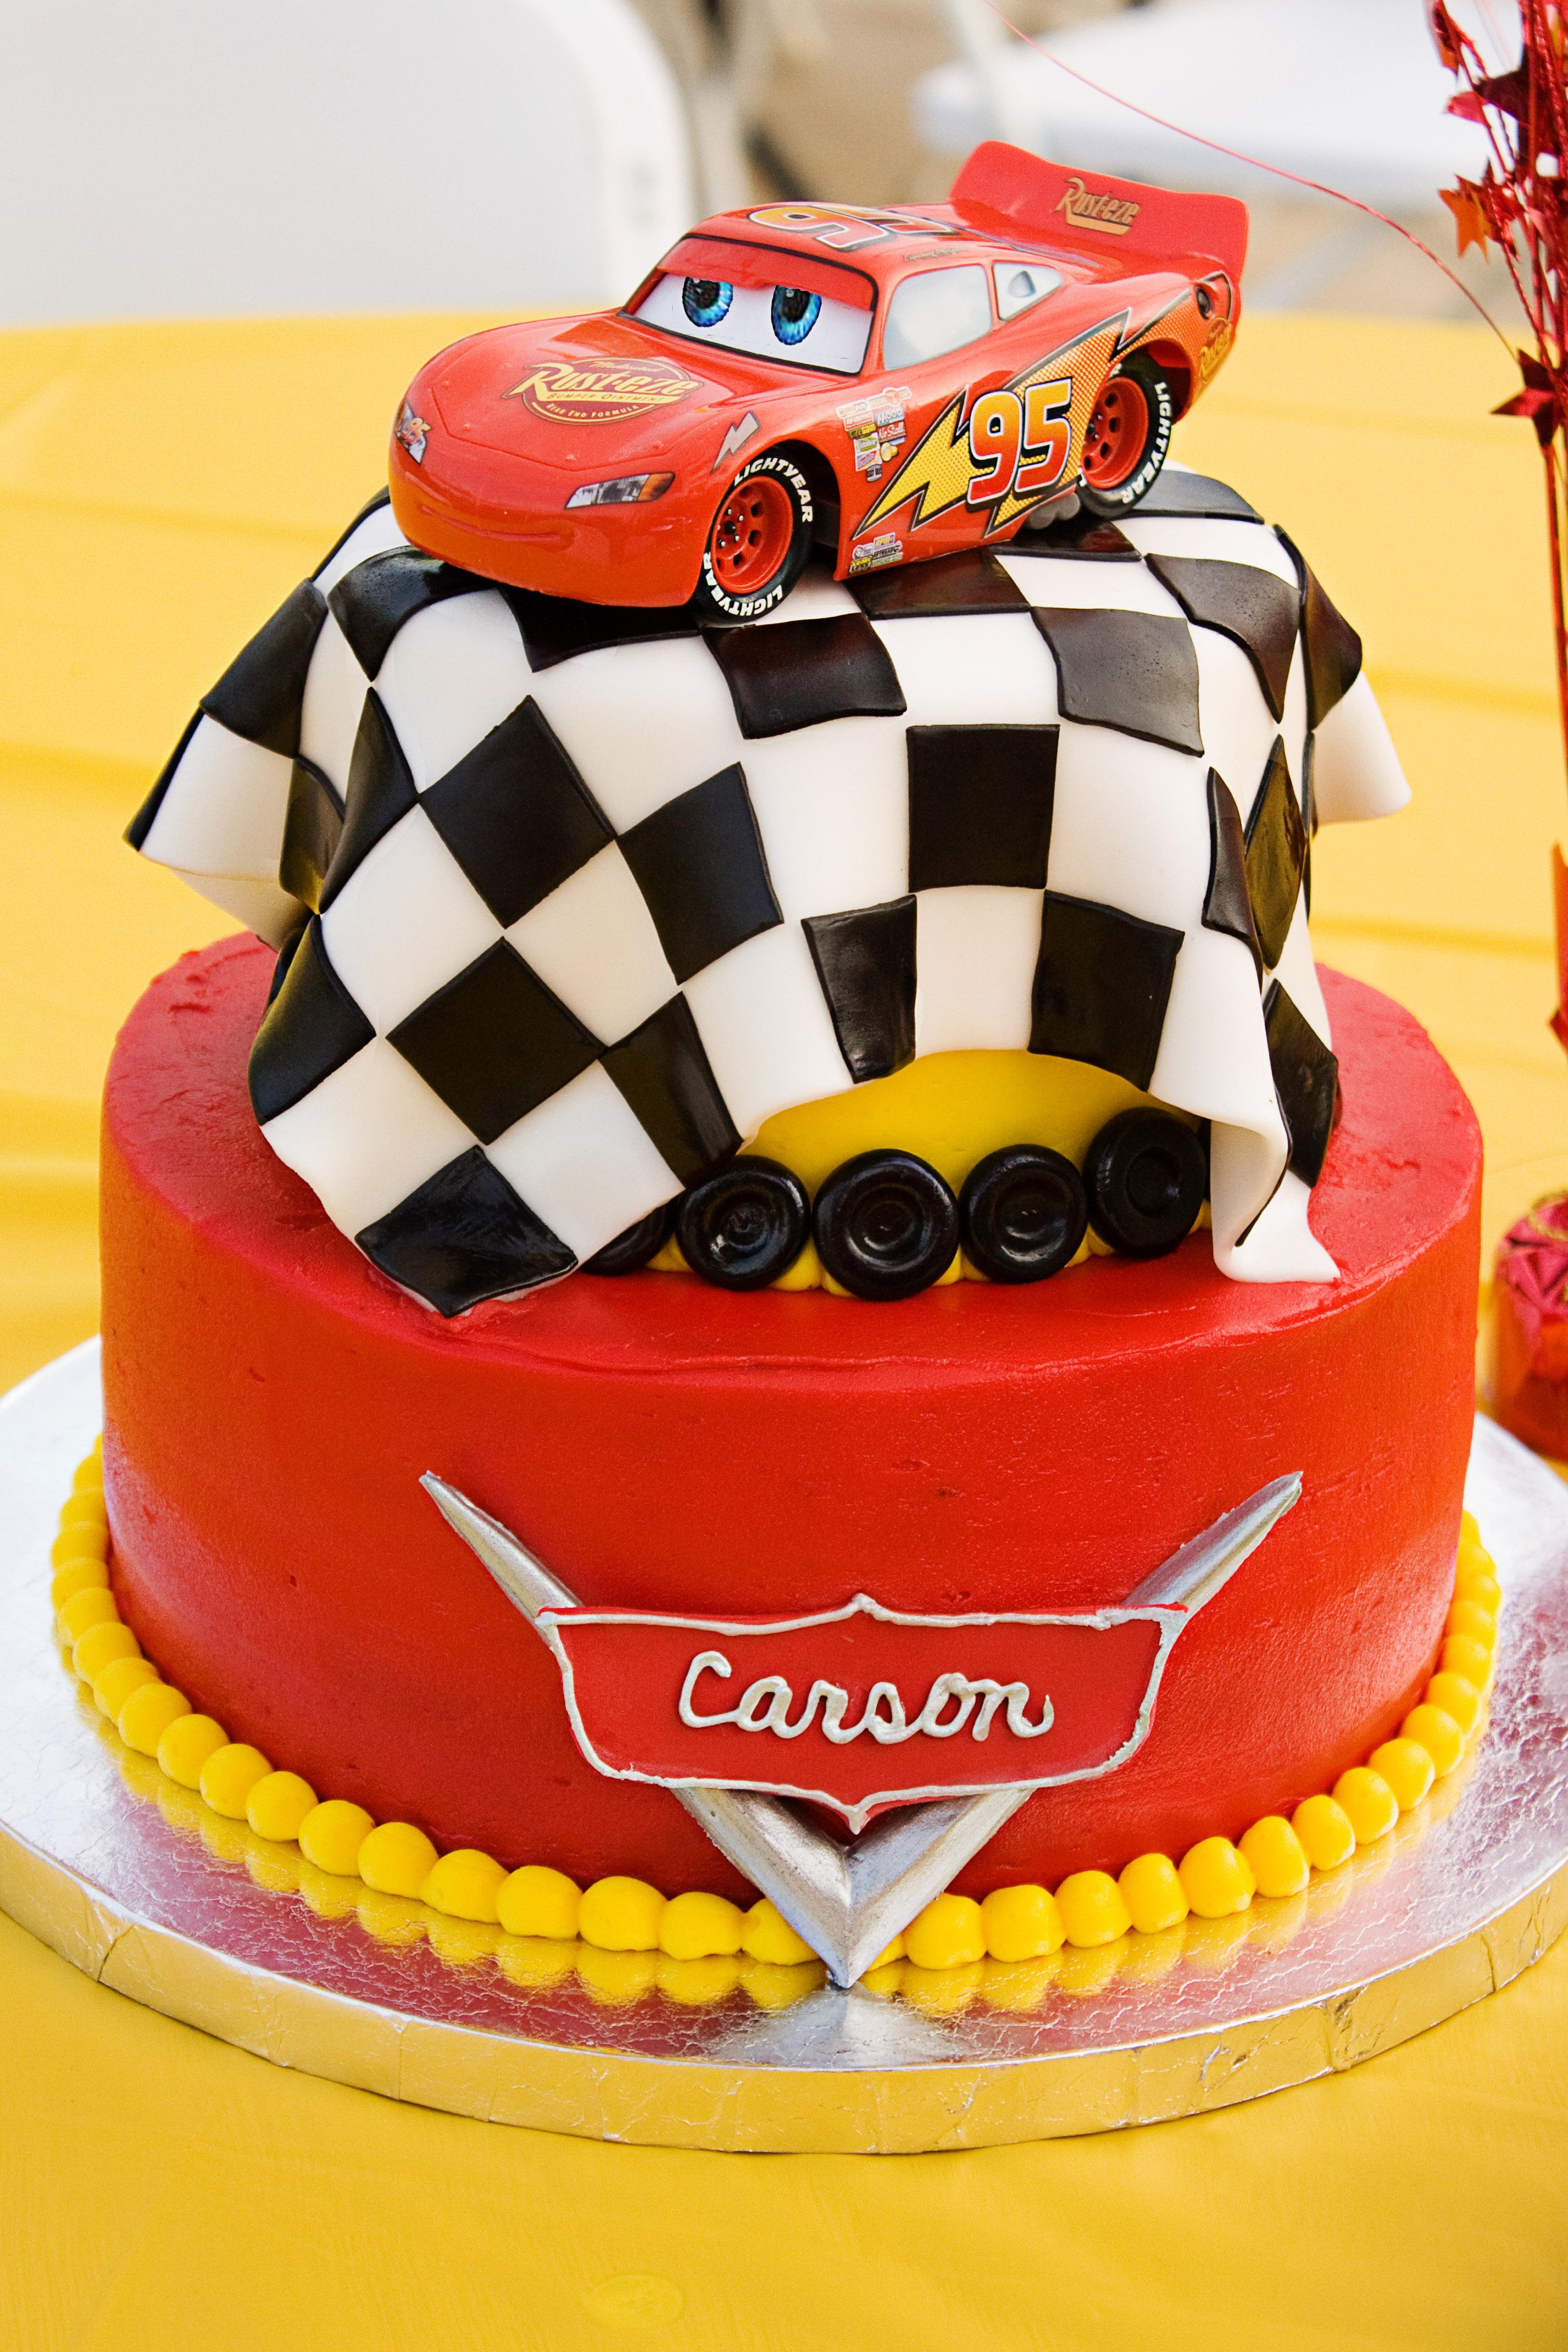 Magnificent 11 Cars Bday Cakes Photo Cars Birthday Cake Cars Birthday Cake Funny Birthday Cards Online Elaedamsfinfo